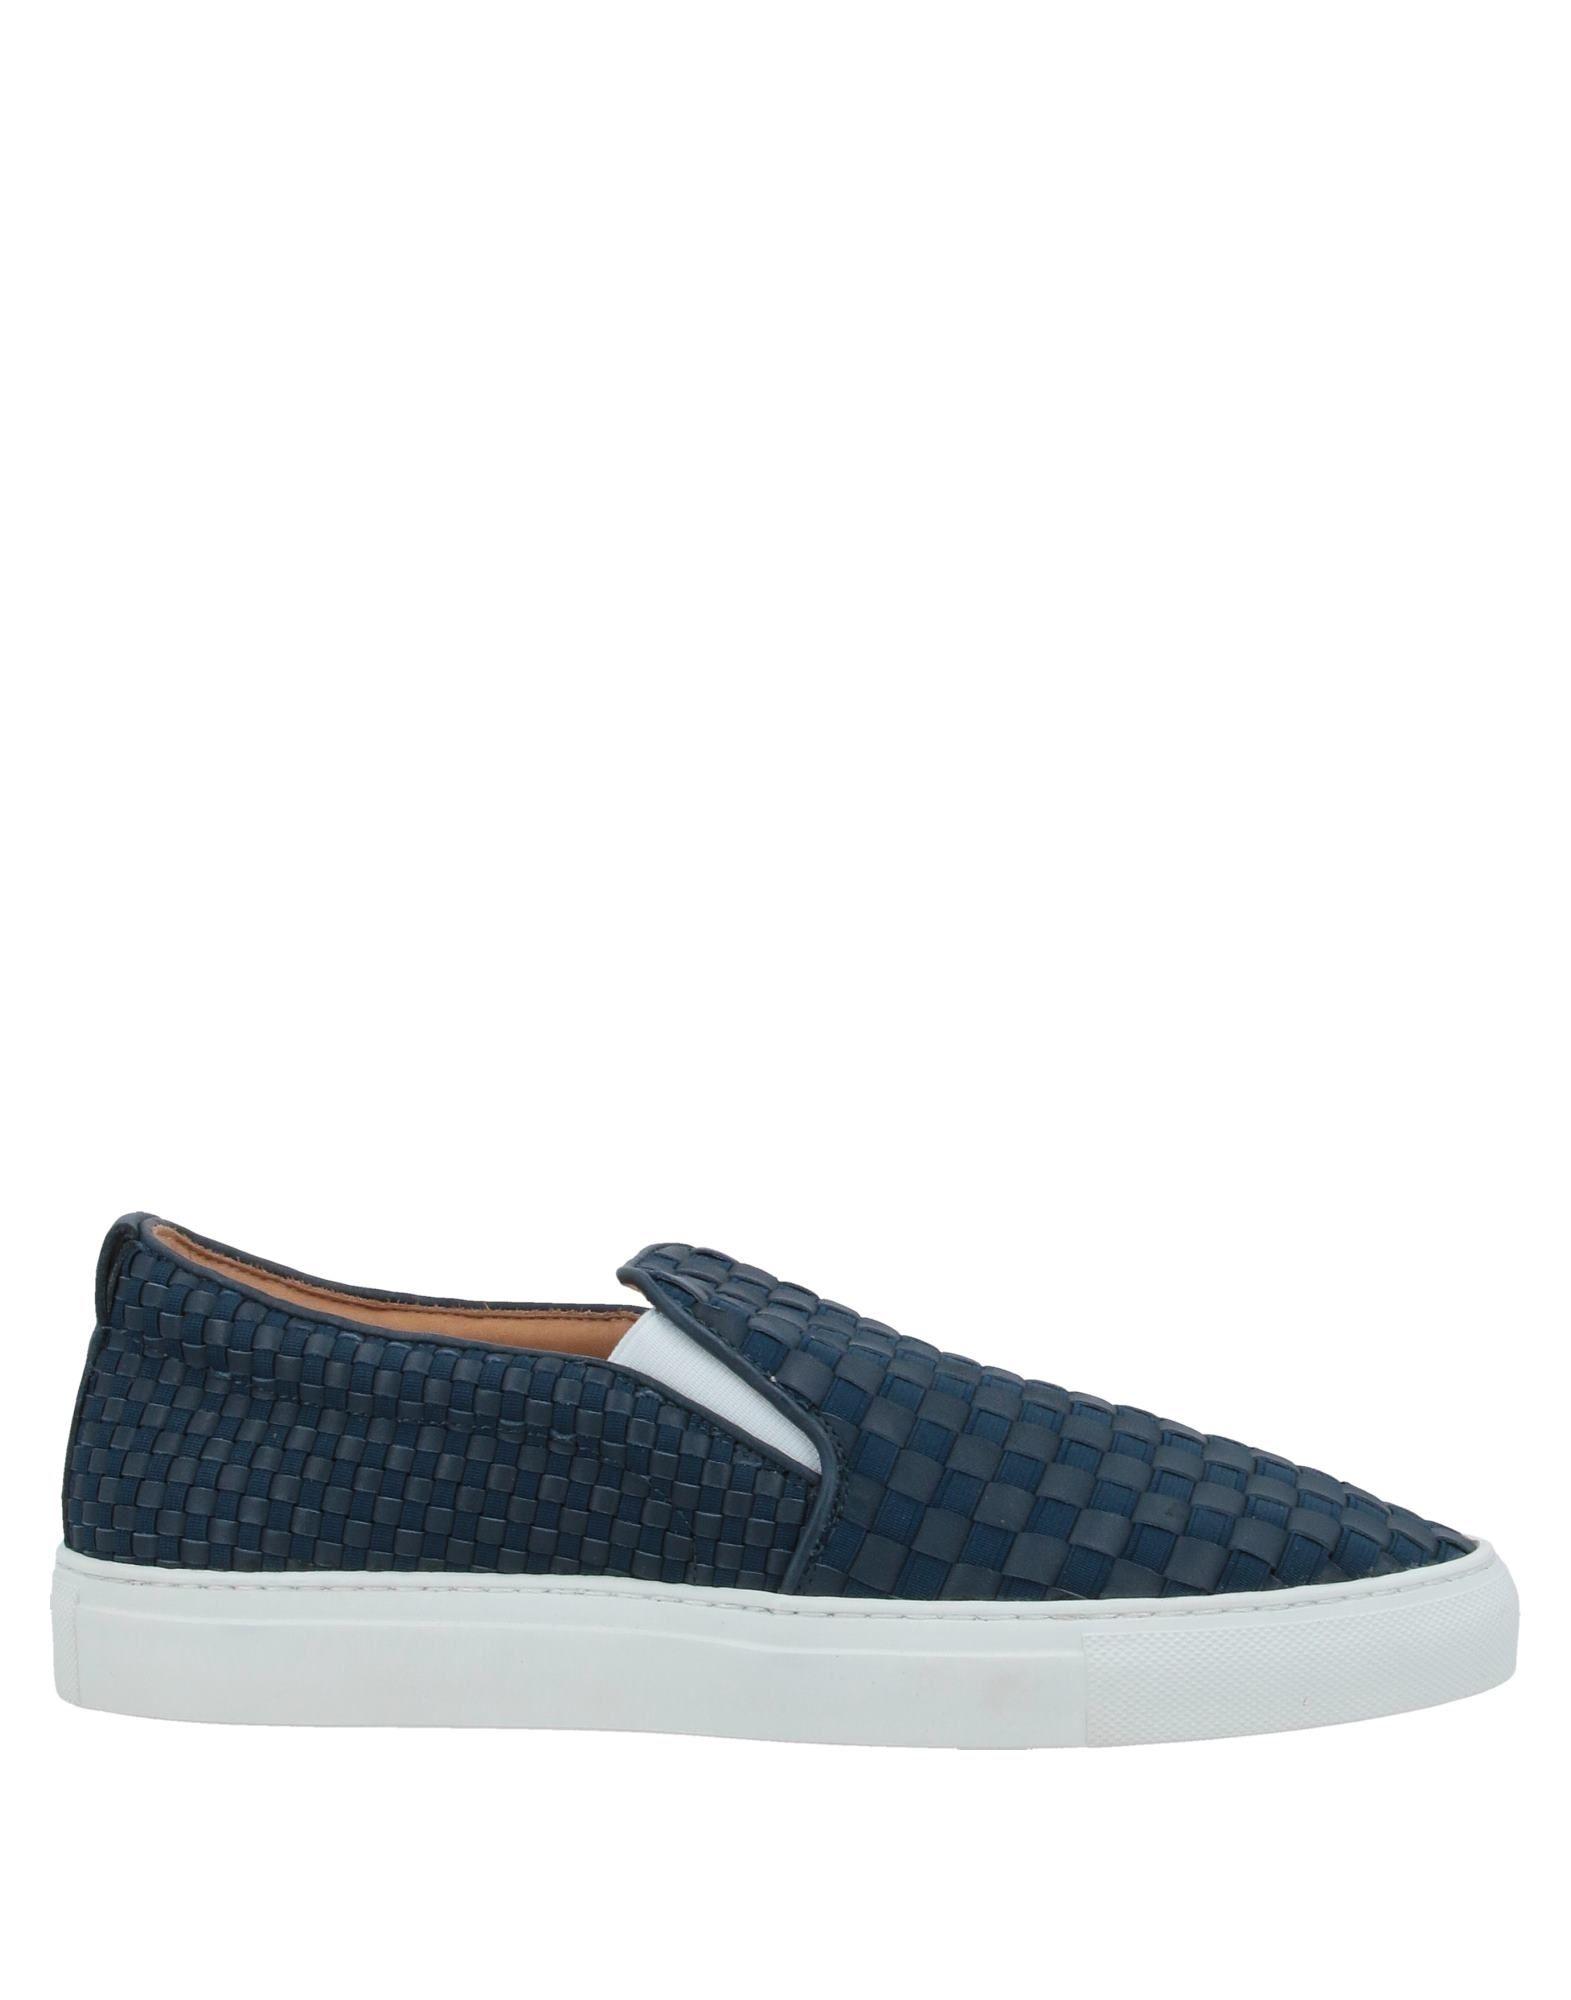 PANTOFOLA D'ORO Low-tops & sneakers - Item 11353601